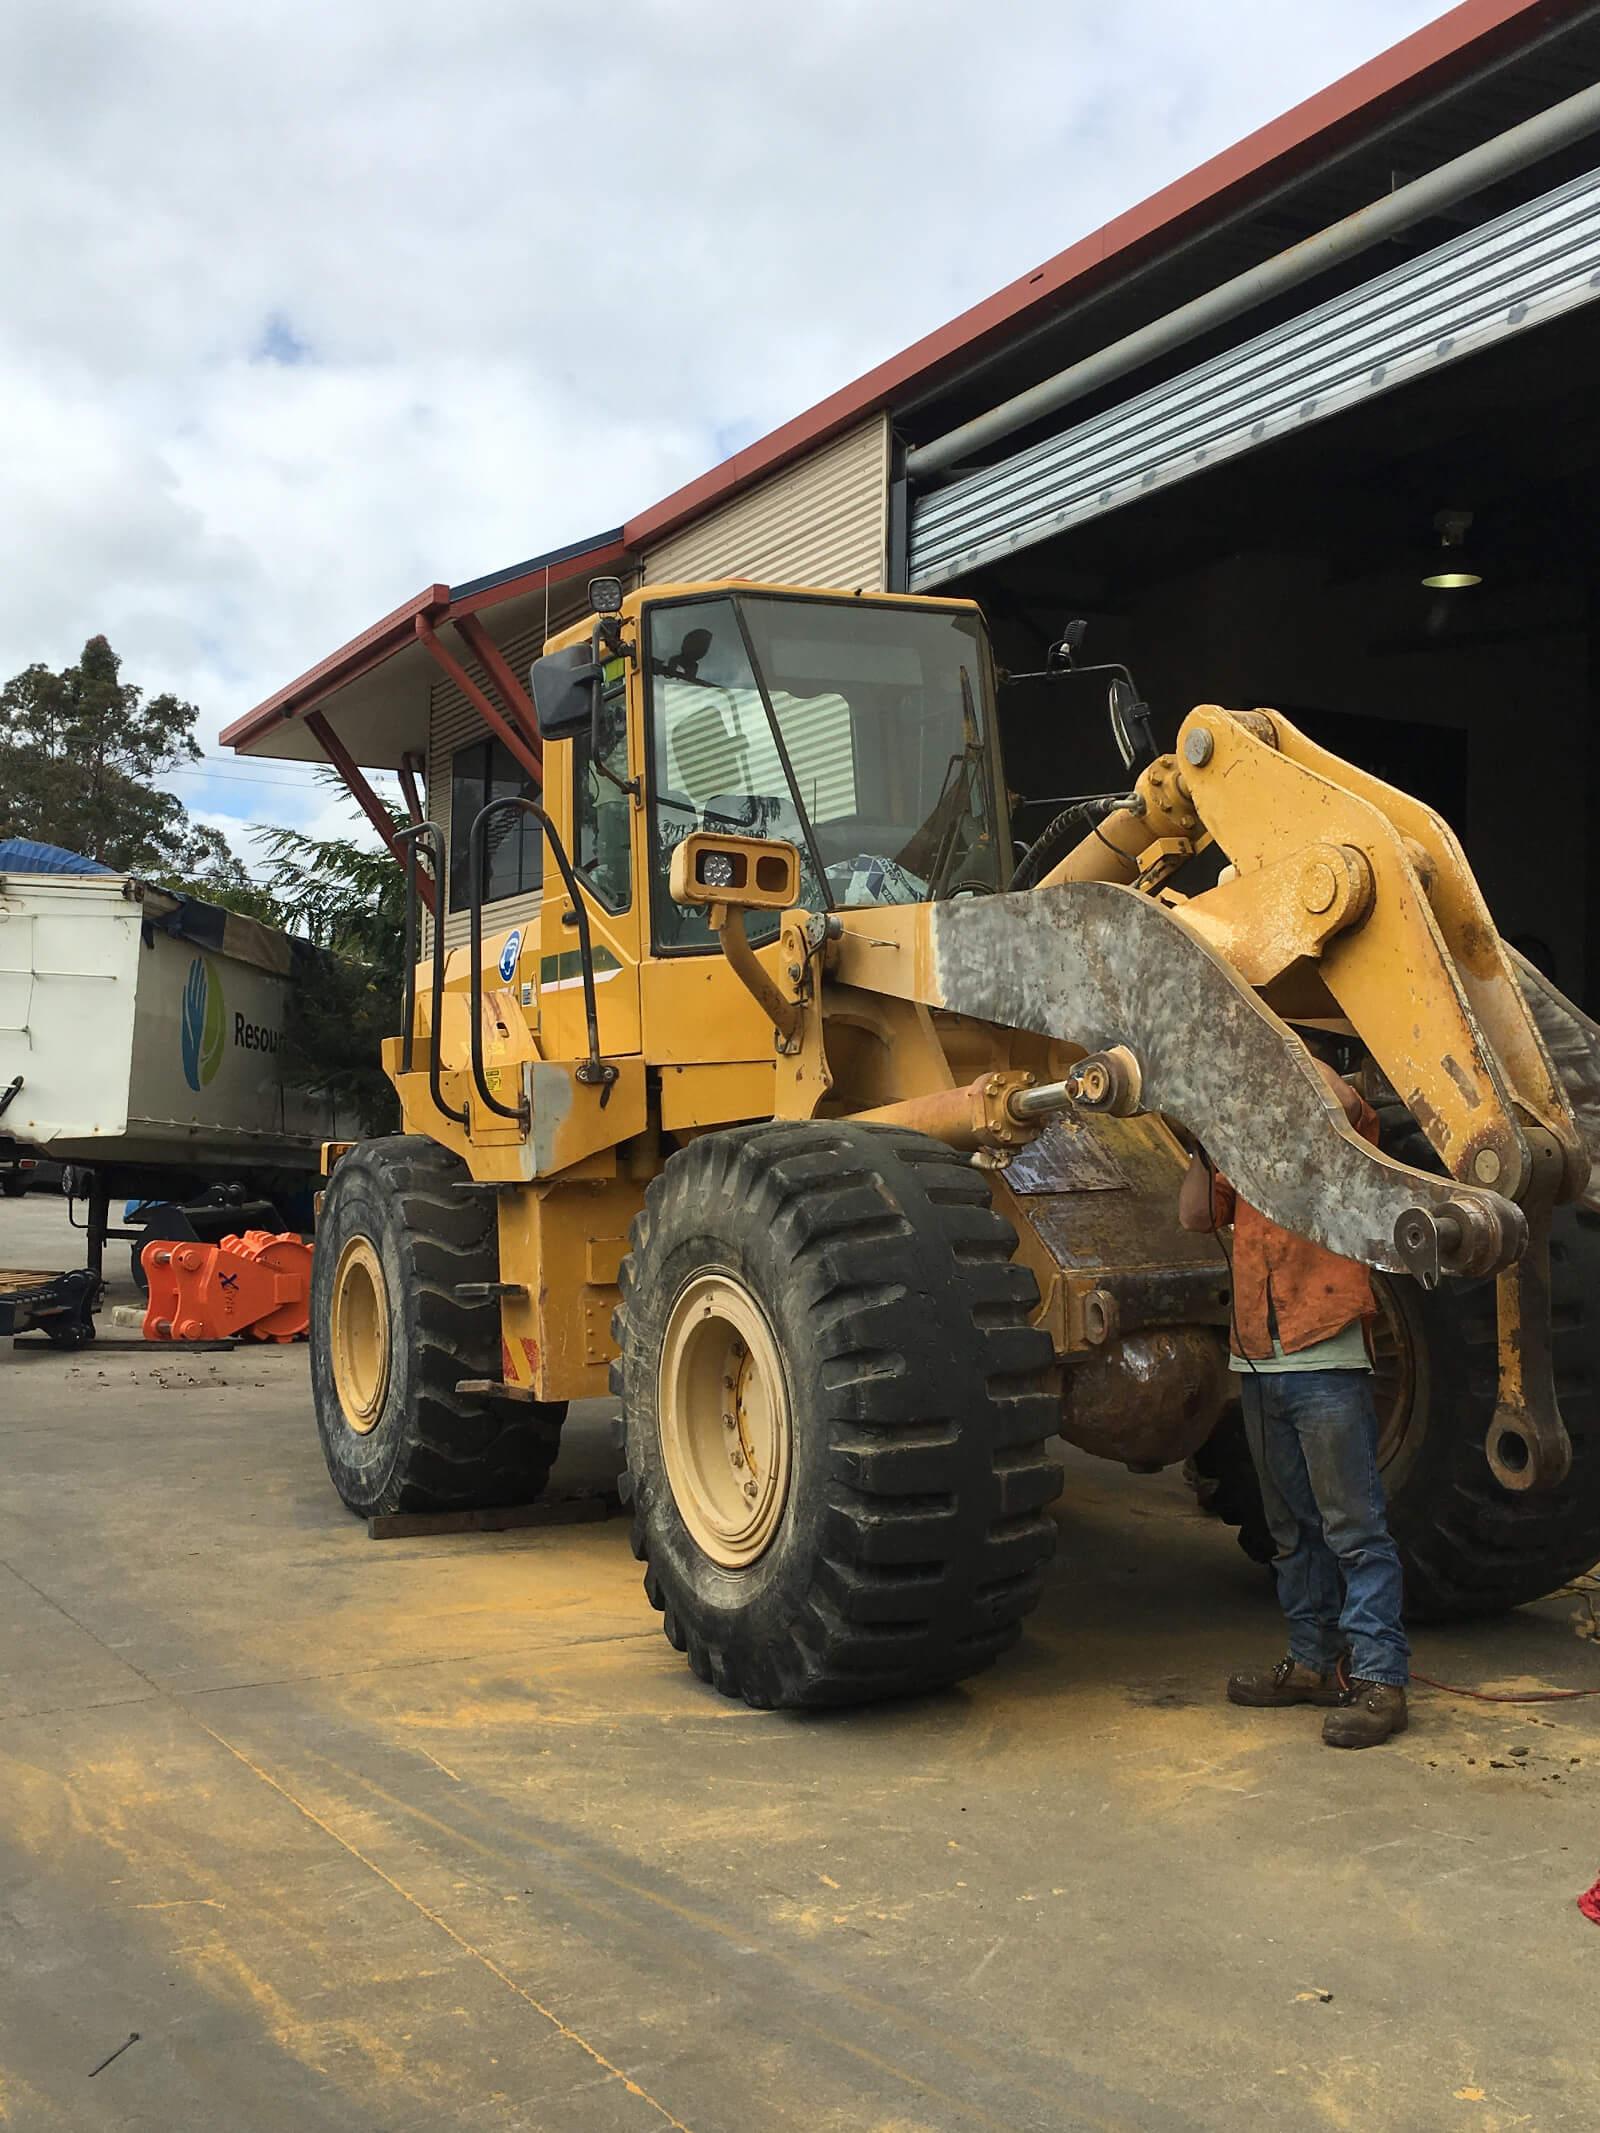 Earthmoving Equipment Refurbishments Before